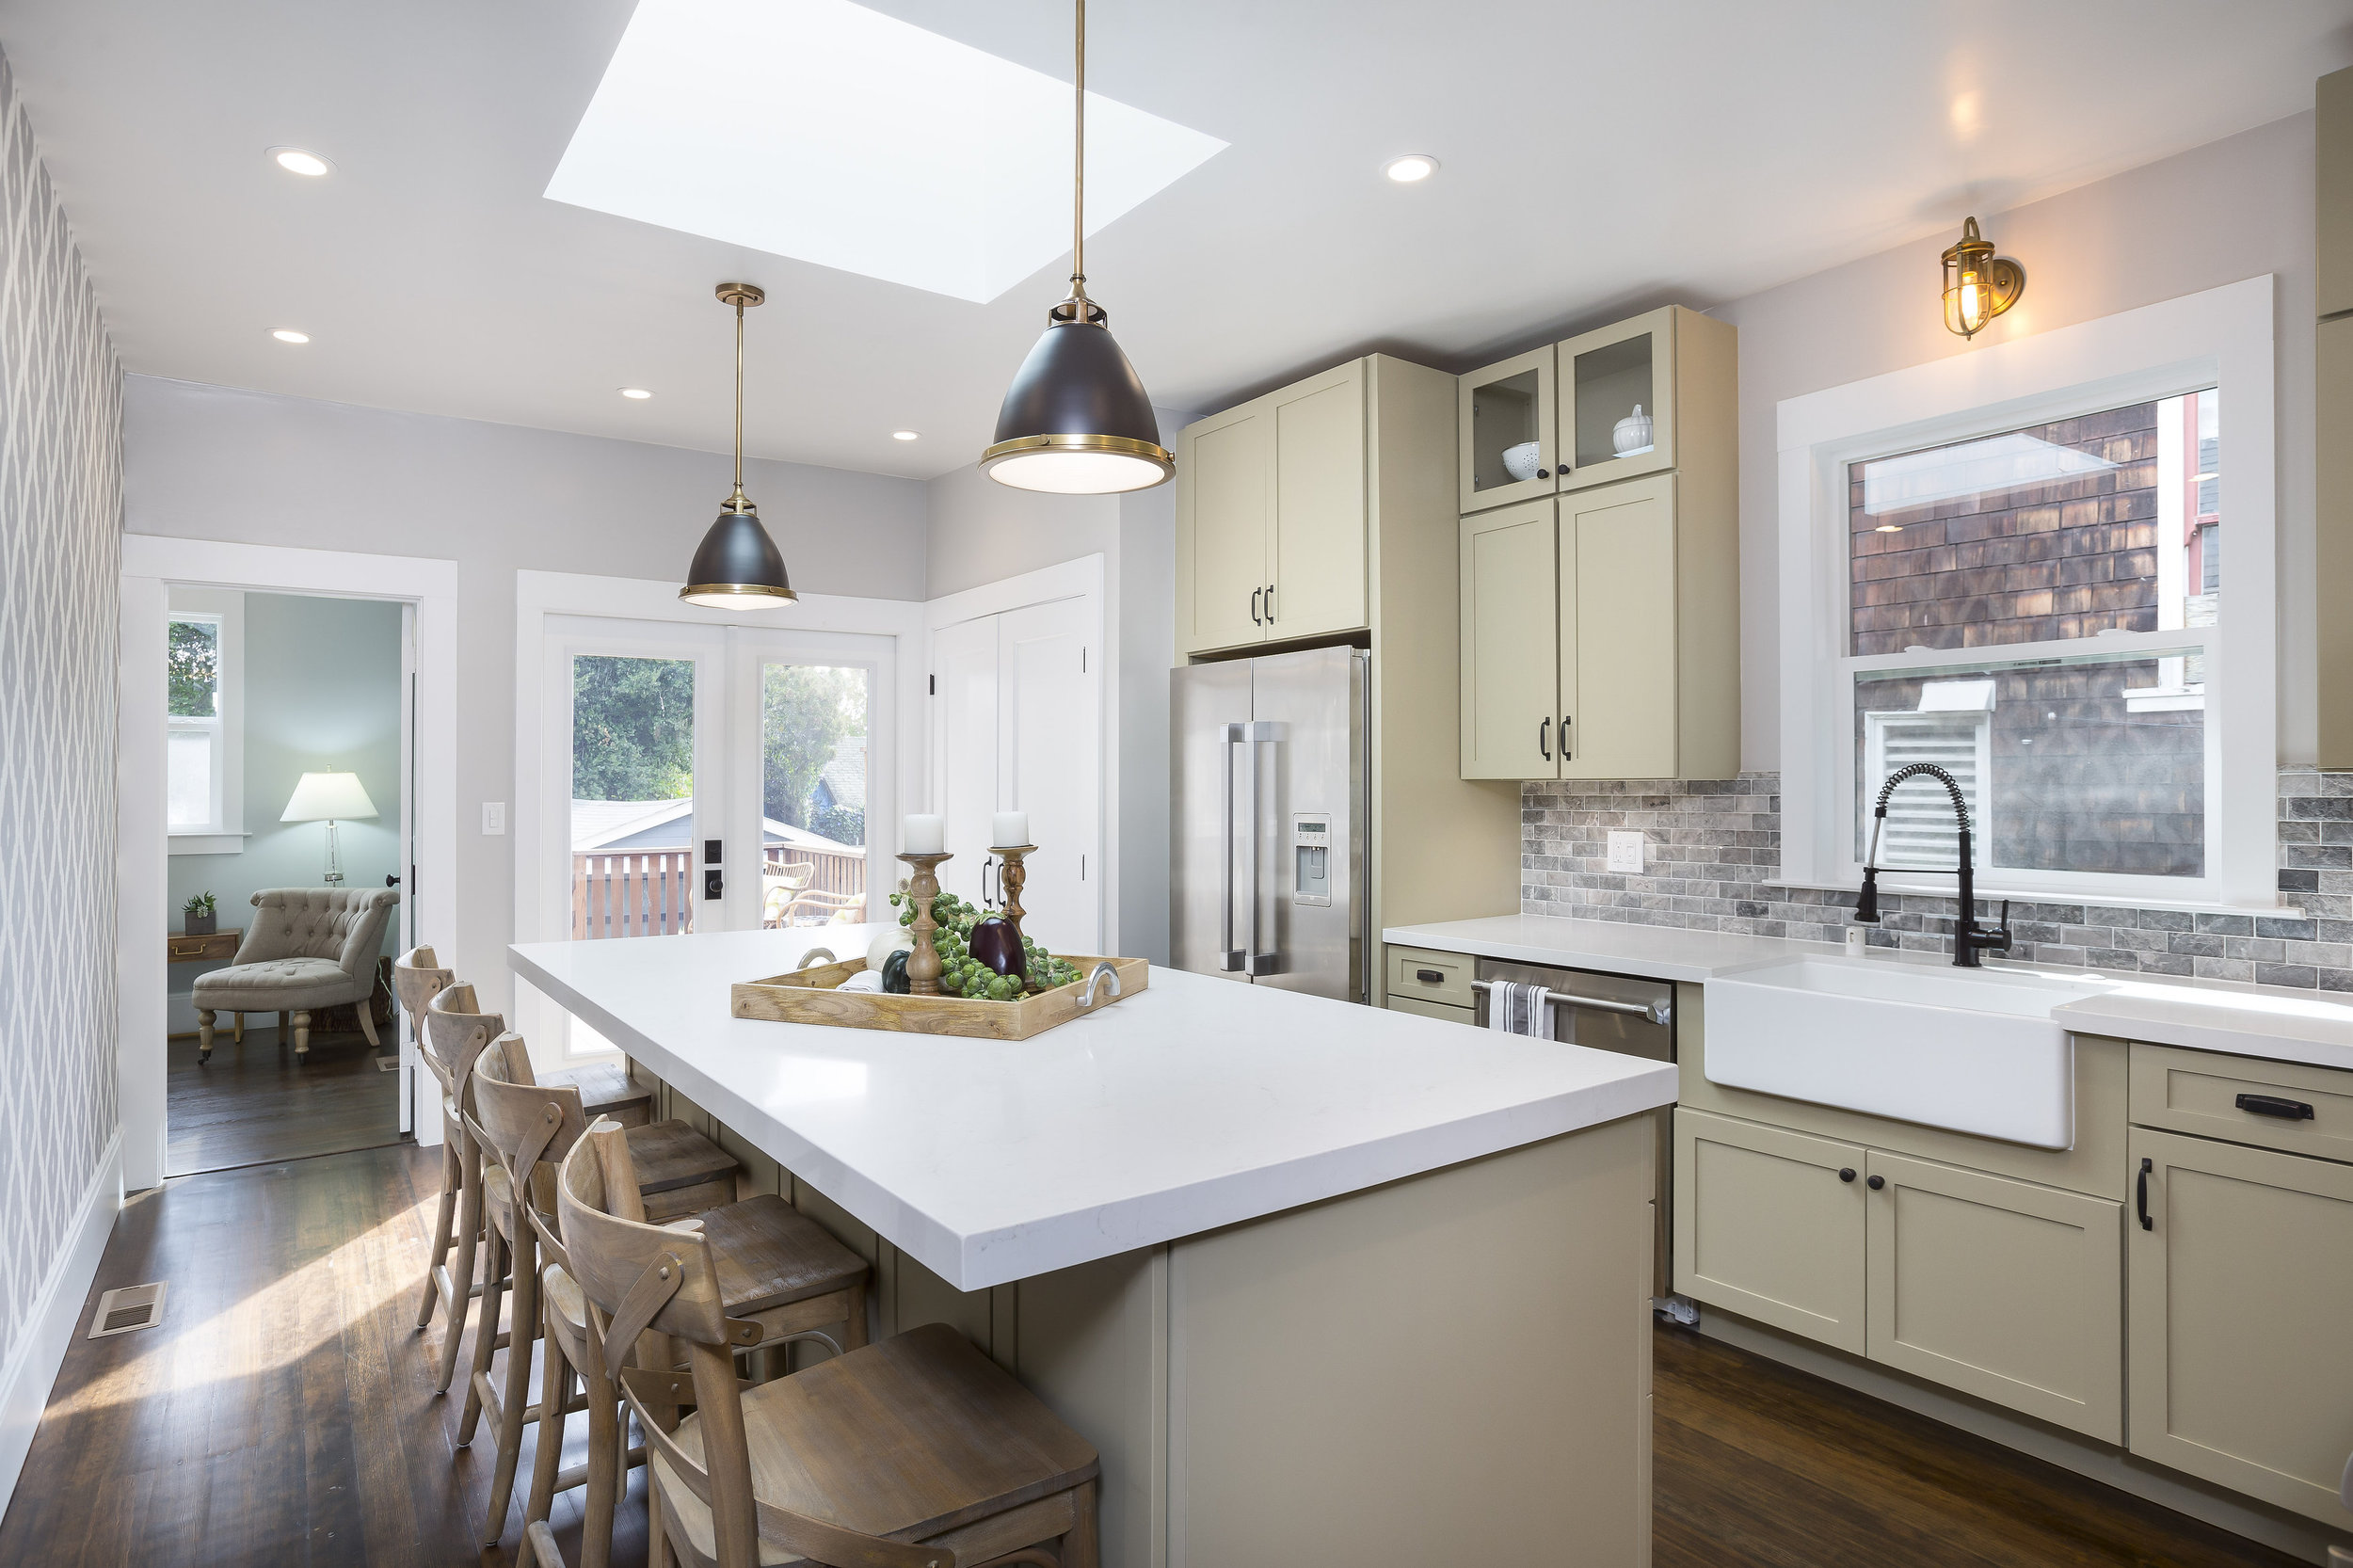 Rockridge, Oakland CA 94618 Home for Sale